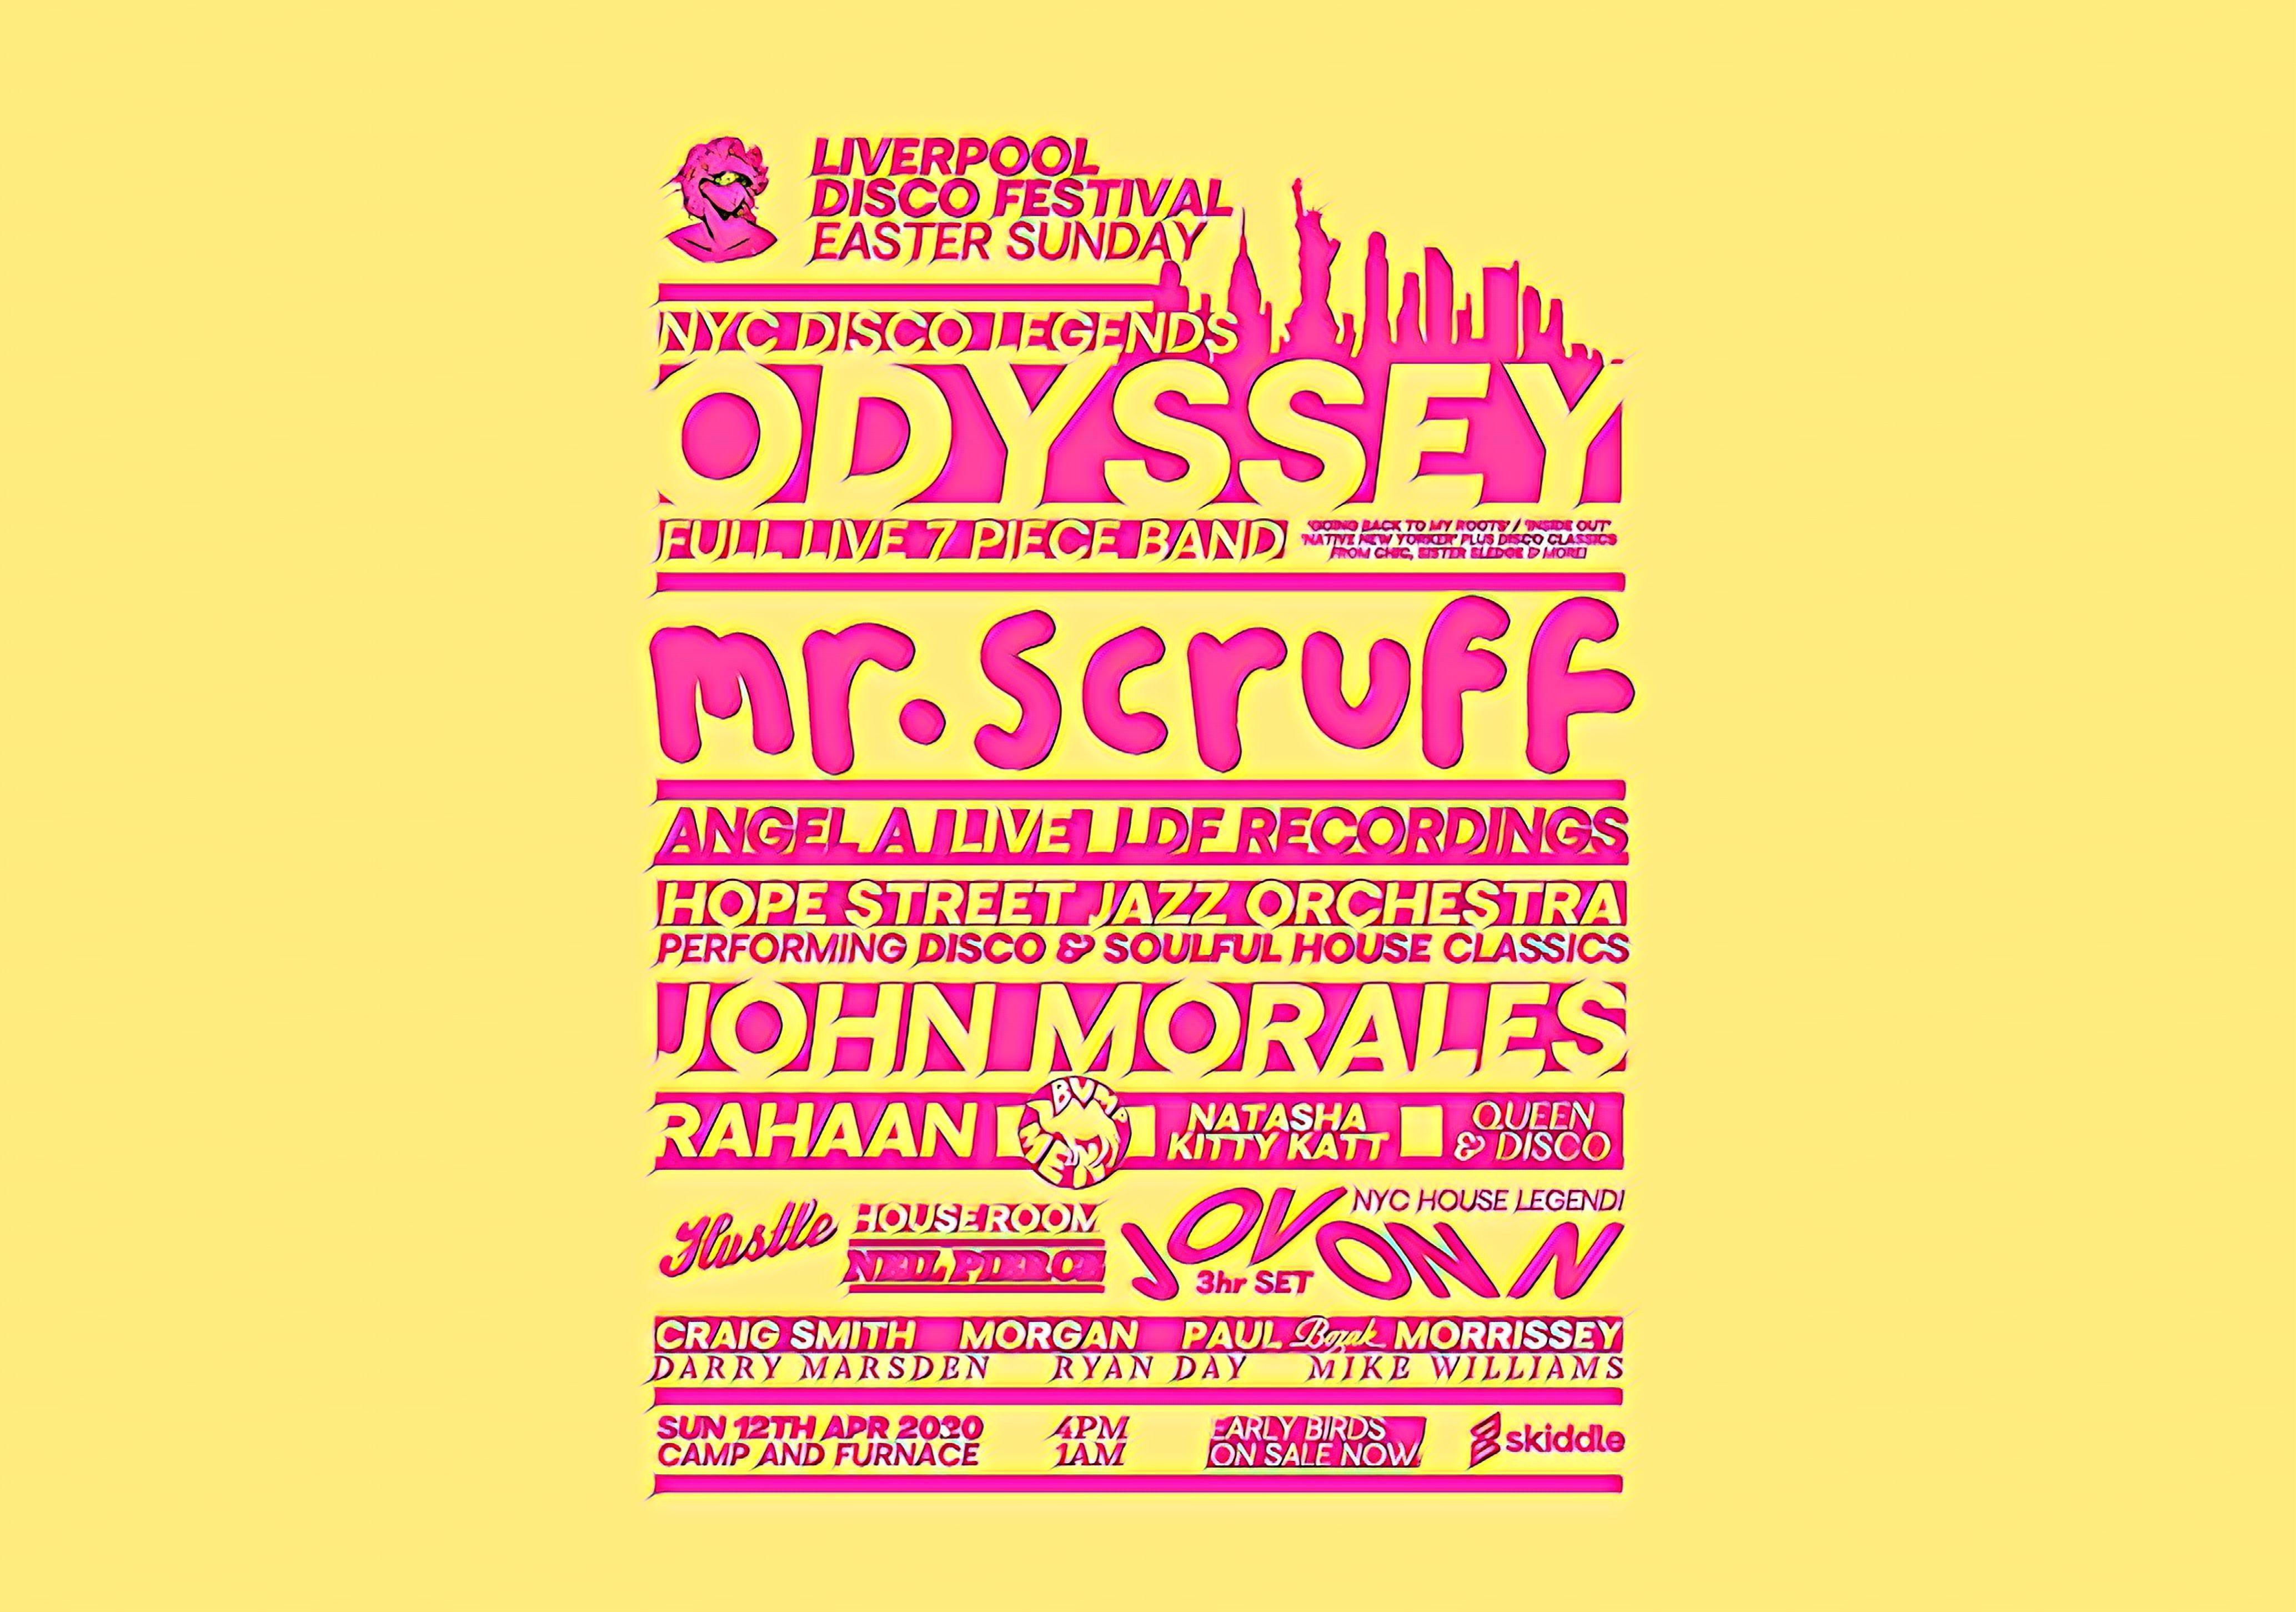 Easter Sunday with Odyssey (Live), Mr Scruff, John Morales, Jovonn & more